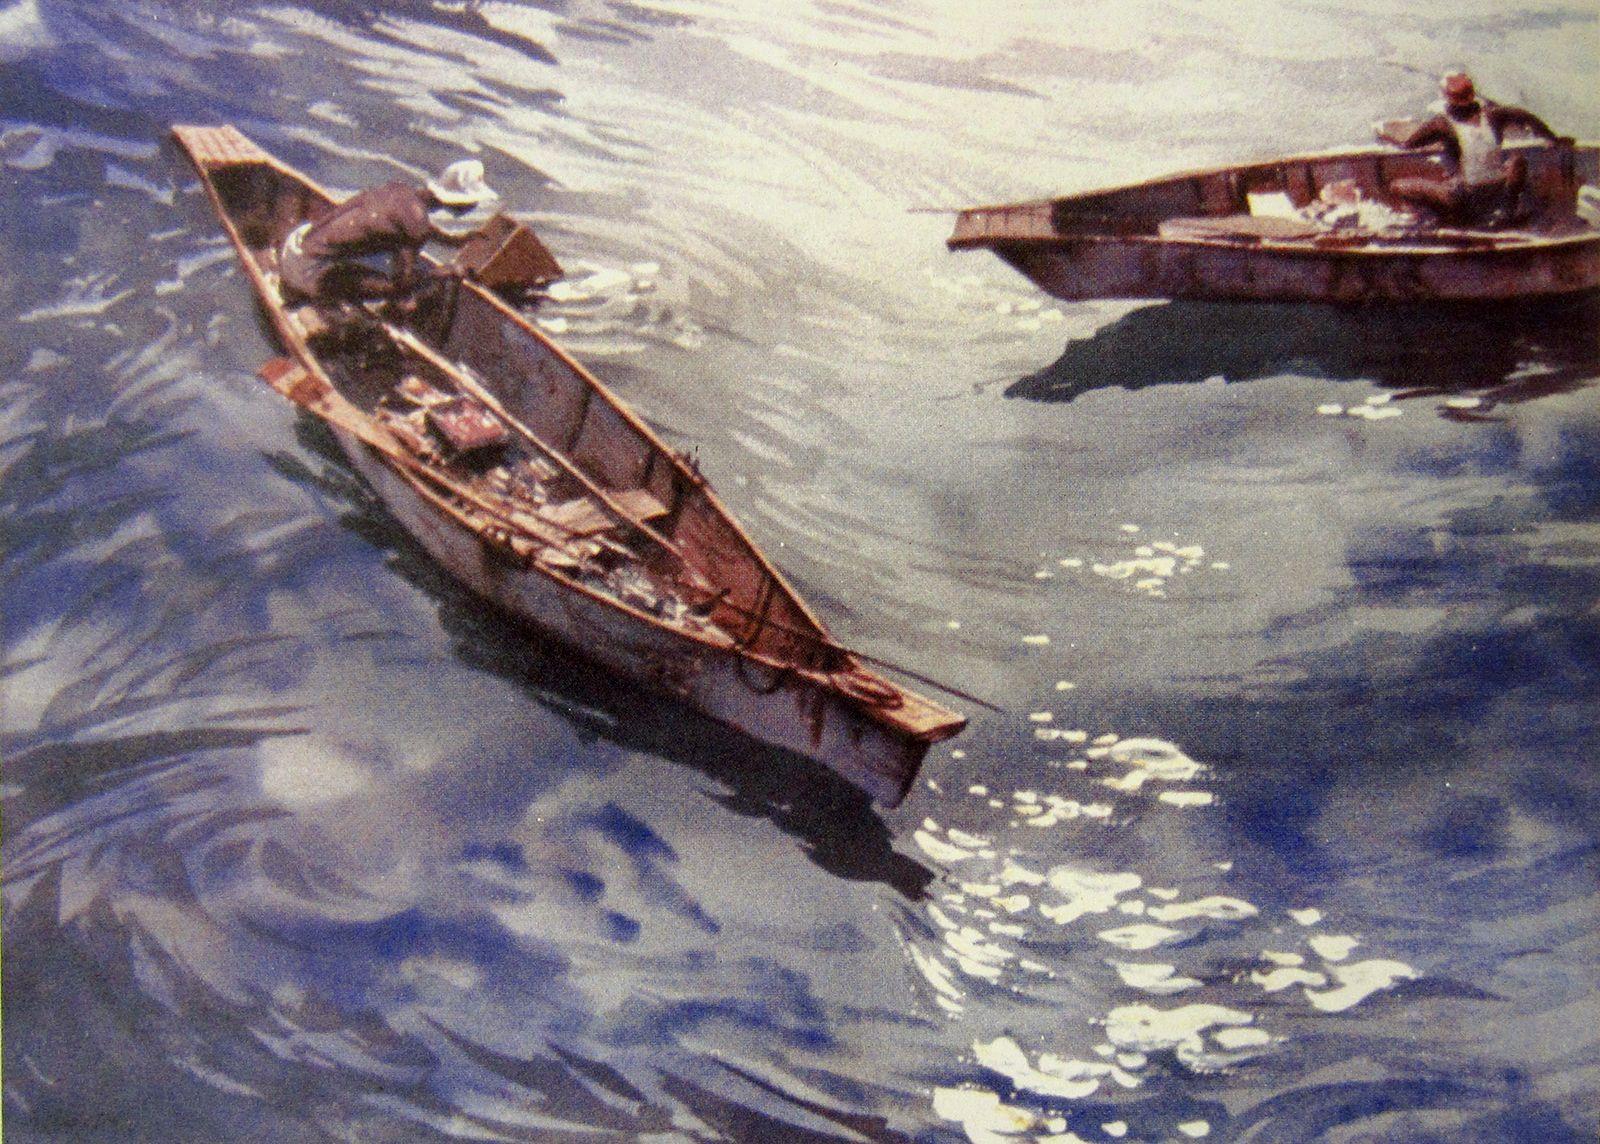 Watercolor art history - John Pike Watercolor